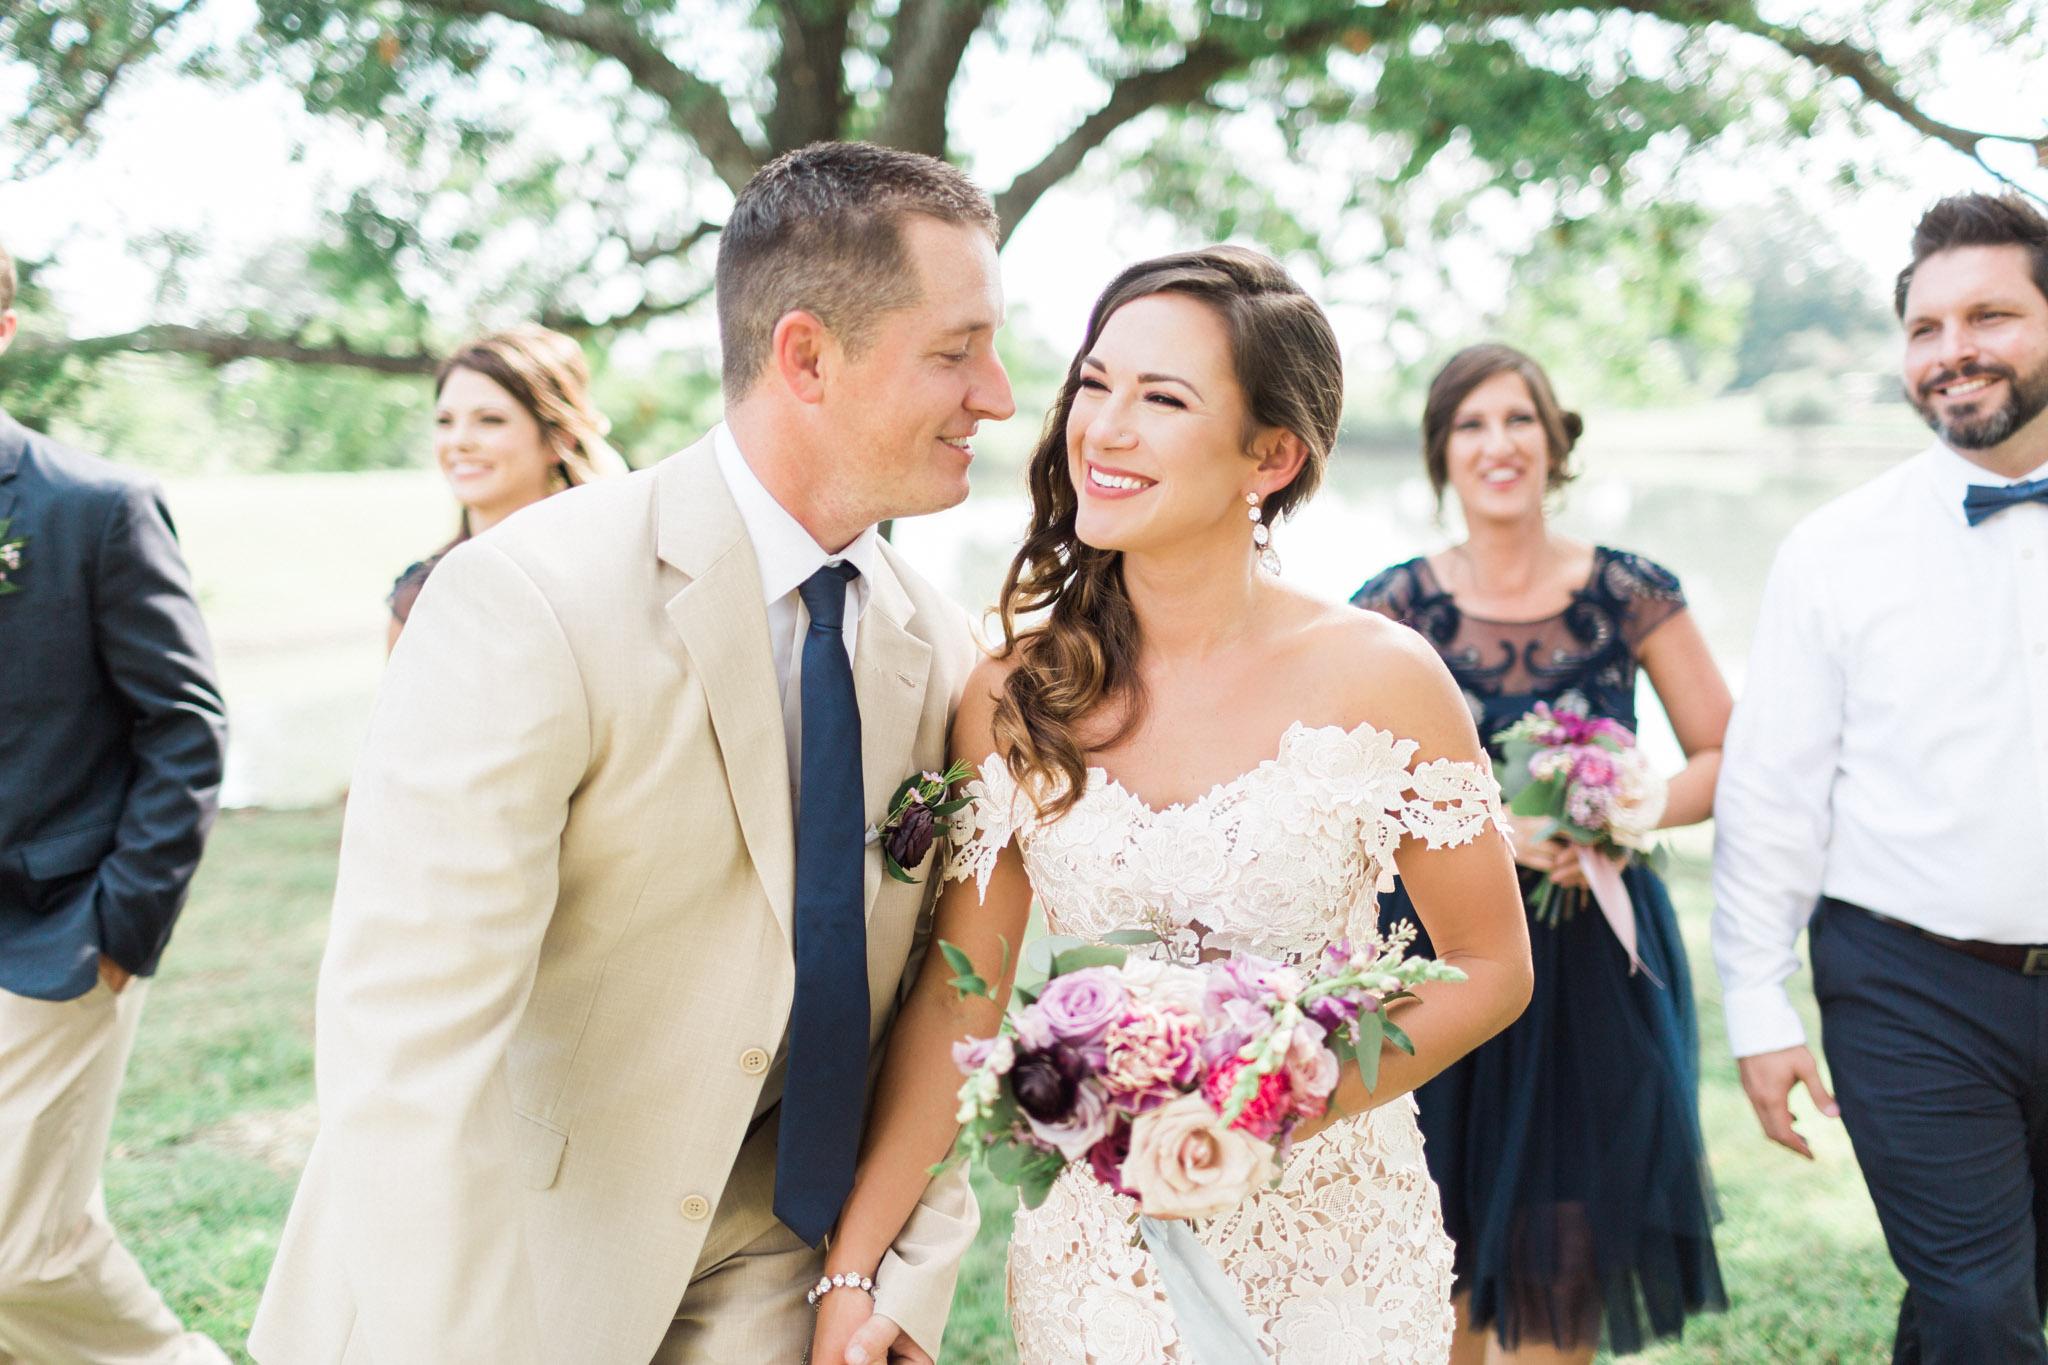 TheBigFakeWedding_DFW_wedding_photographer-1.jpg